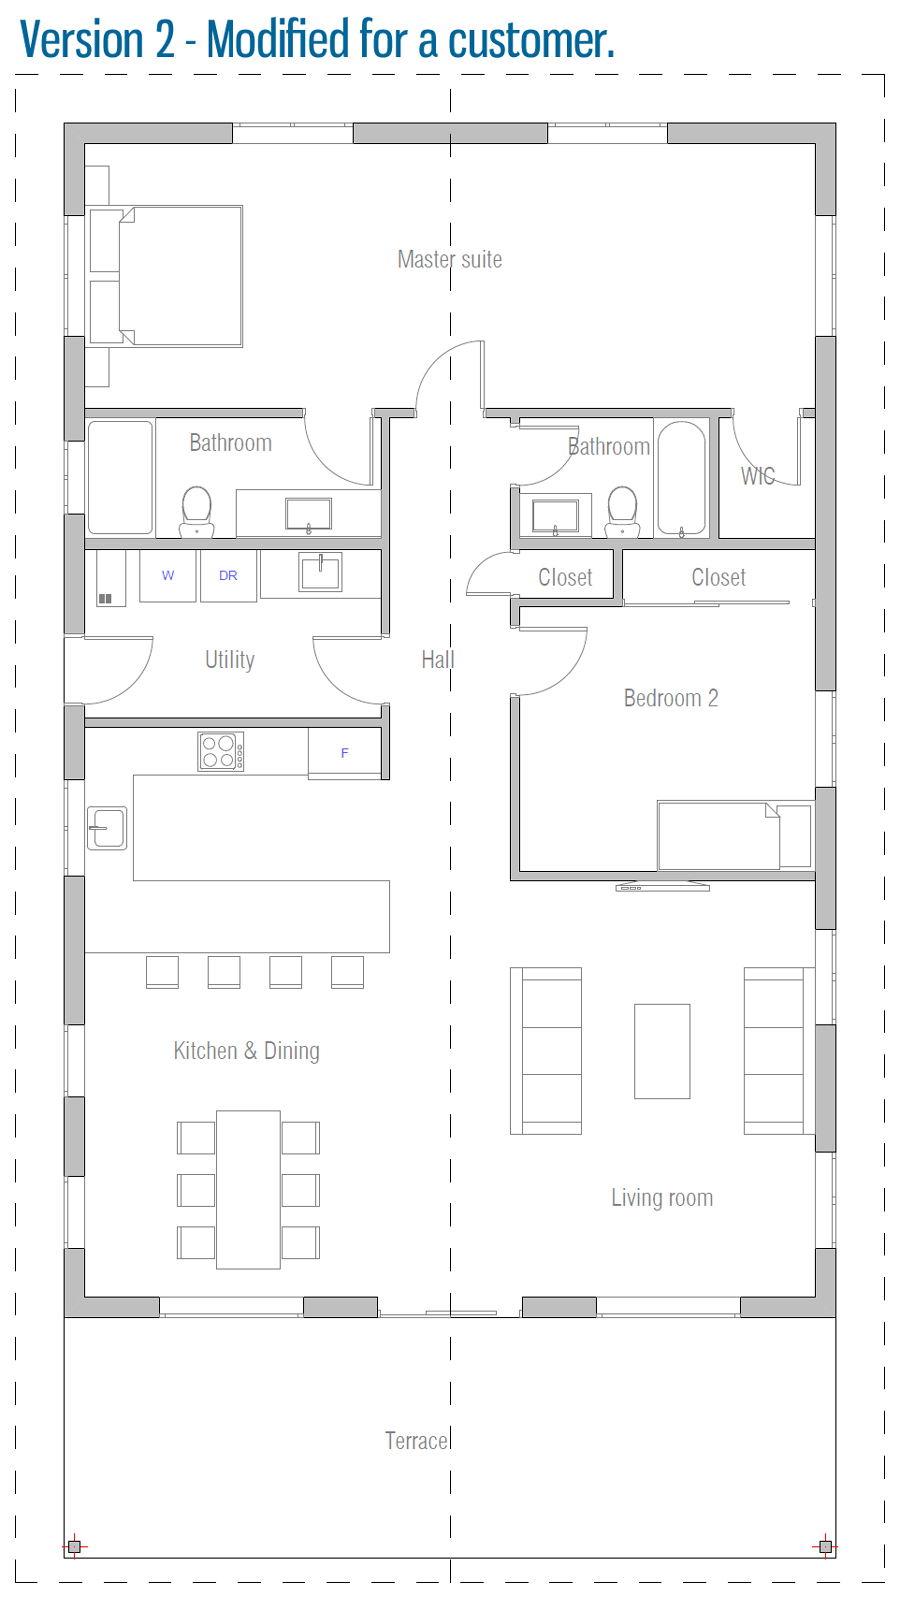 affordable-homes_14_CH489_V2.jpg